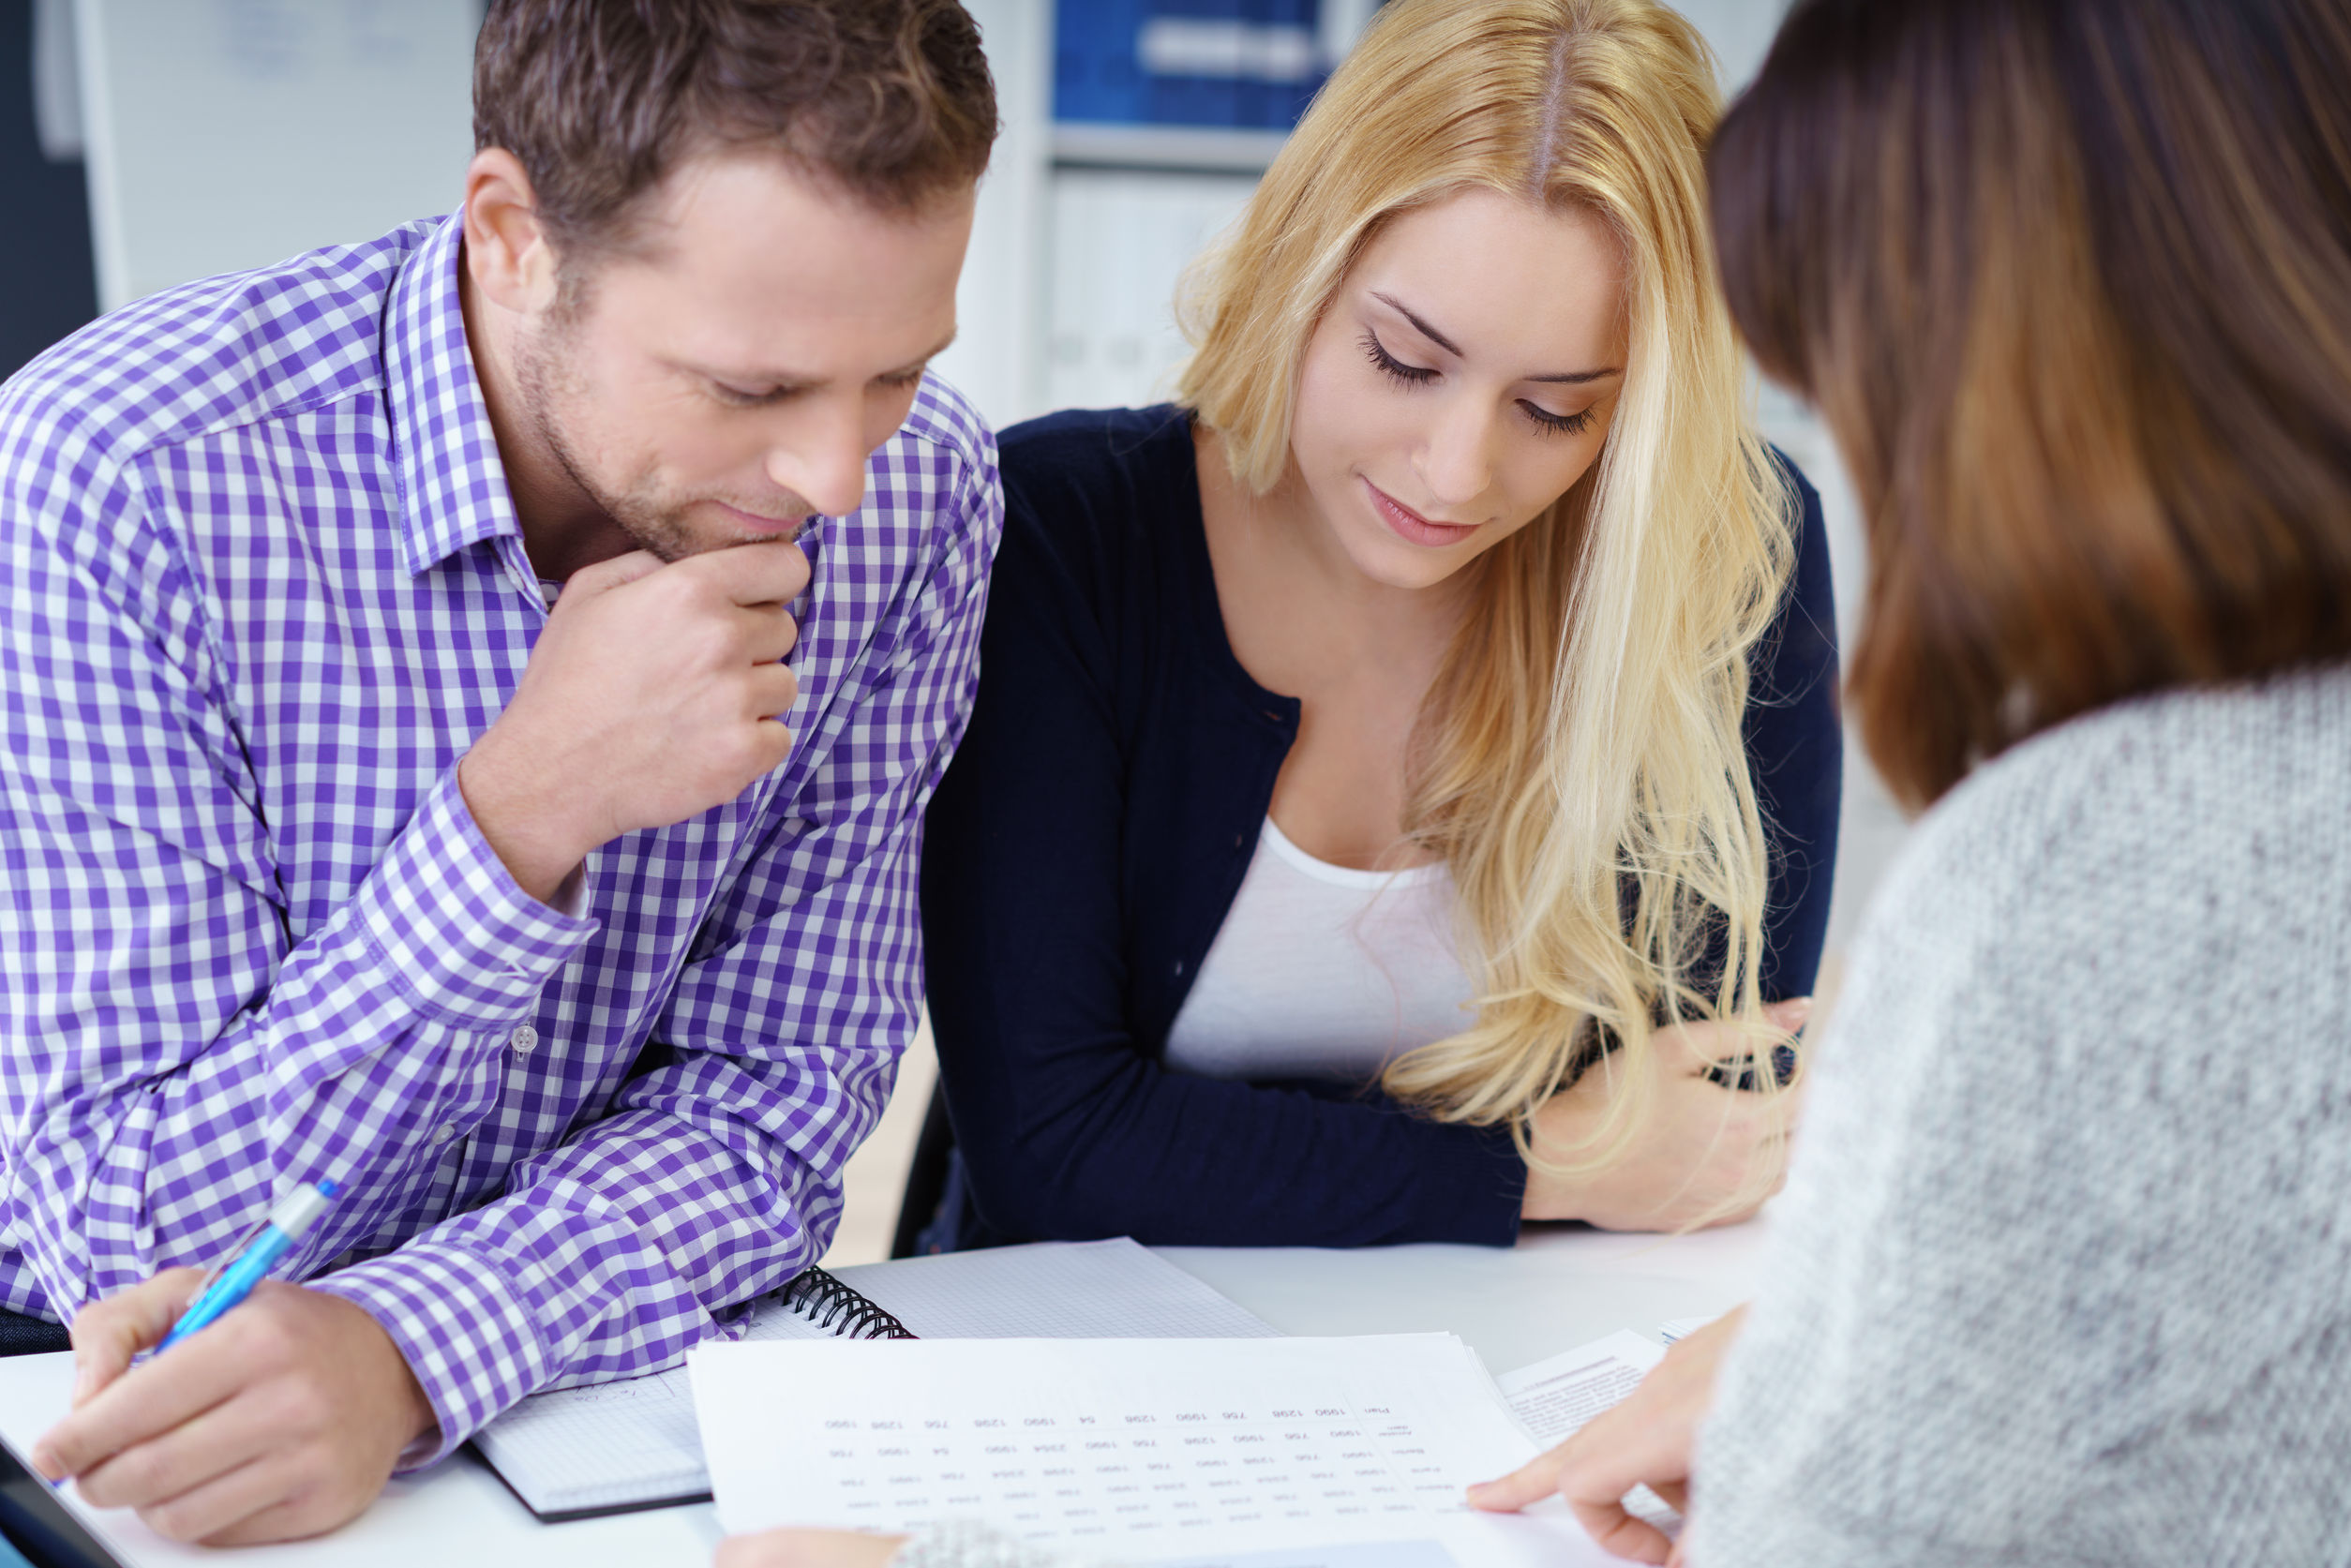 Customer Focus Drives Business Performance